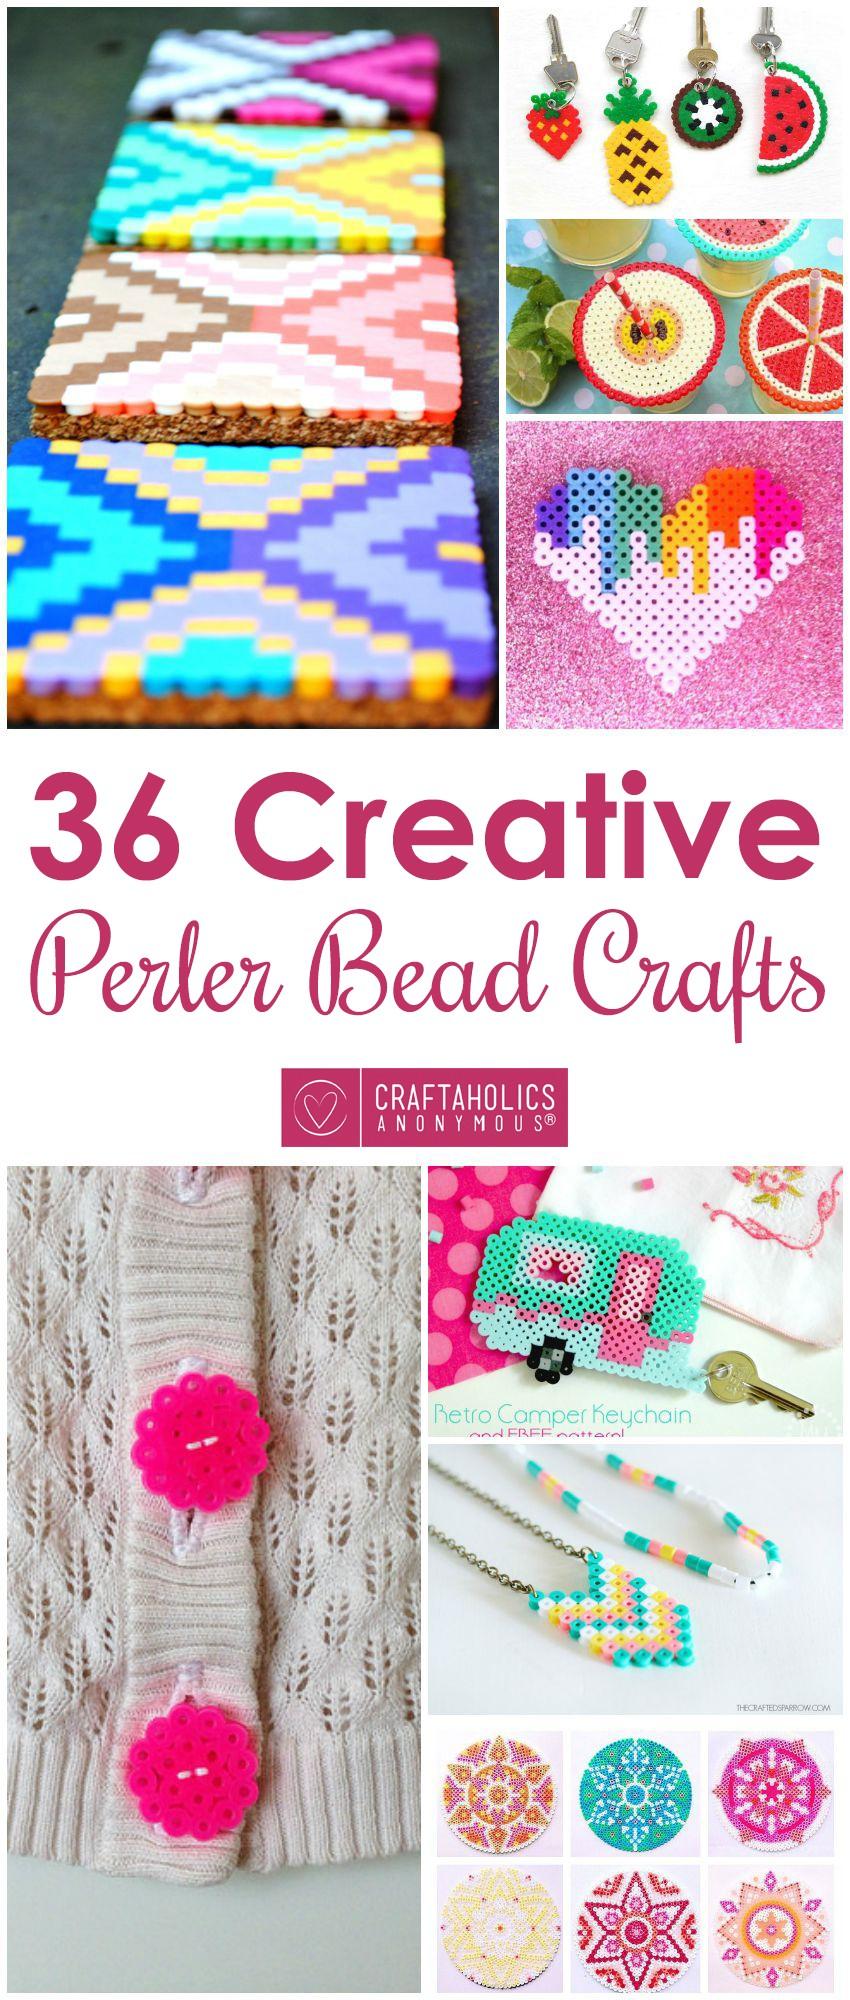 36 Perler Bead Crafts Craftaholics Anonymous®